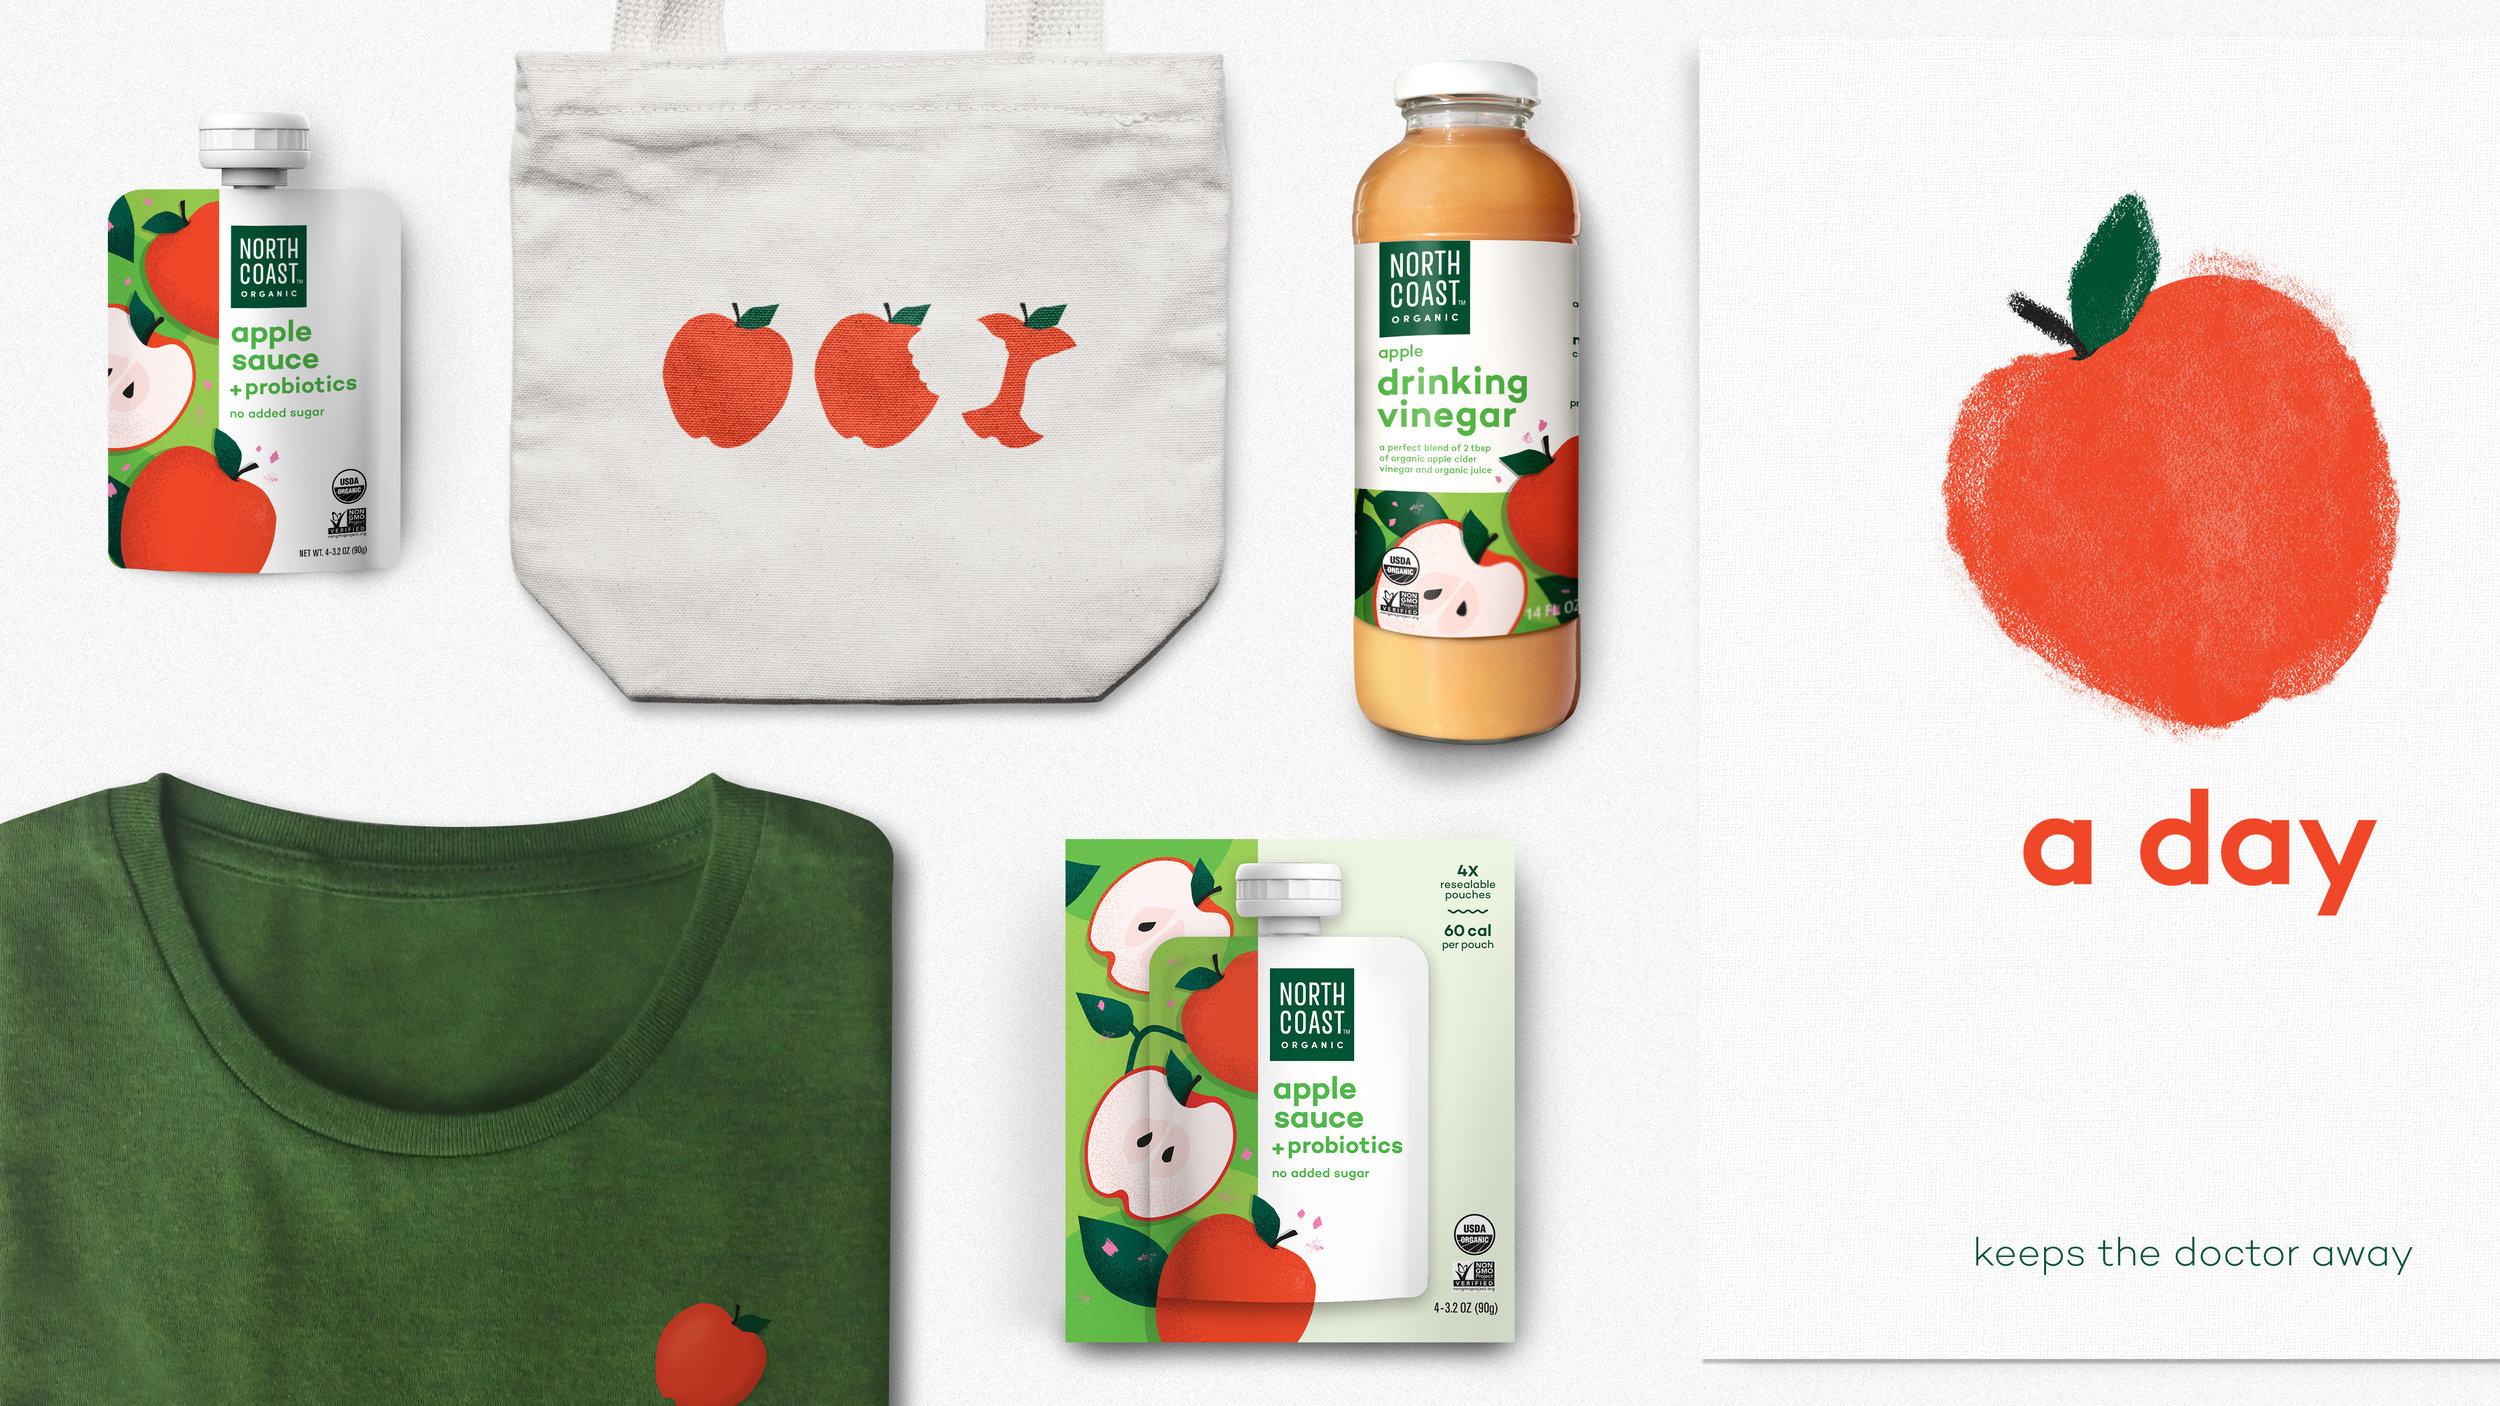 Northcoast organic brand applications